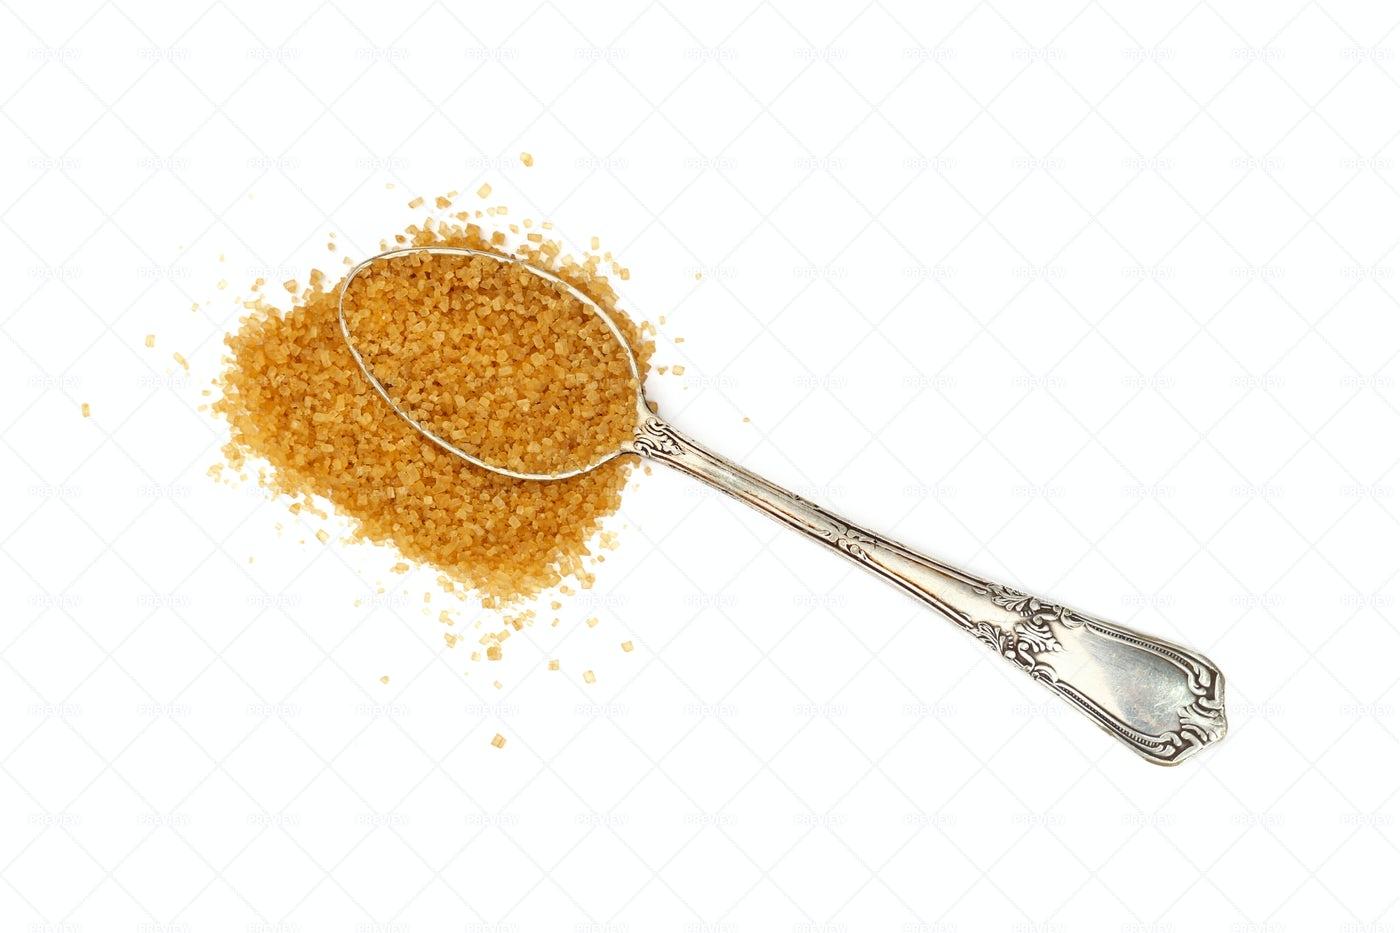 Teaspoon Of Brown Sugar: Stock Photos